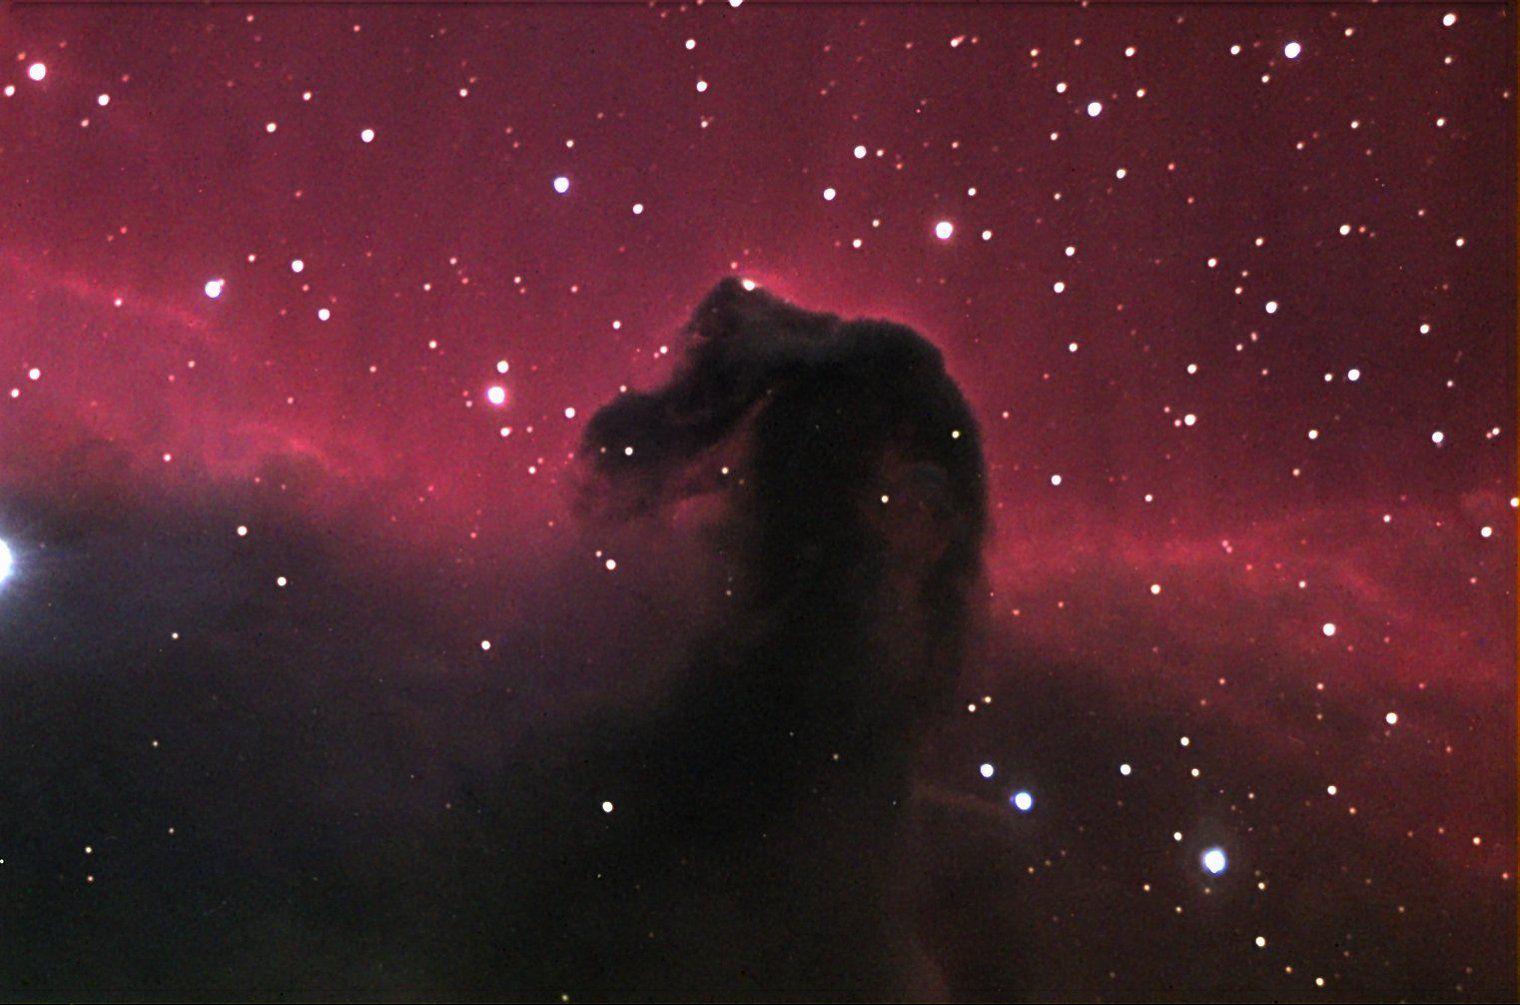 Download Wallpaper Horse Nebula - b91043887abec016b834bfe8e98072f4  Perfect Image Reference_7937.jpg